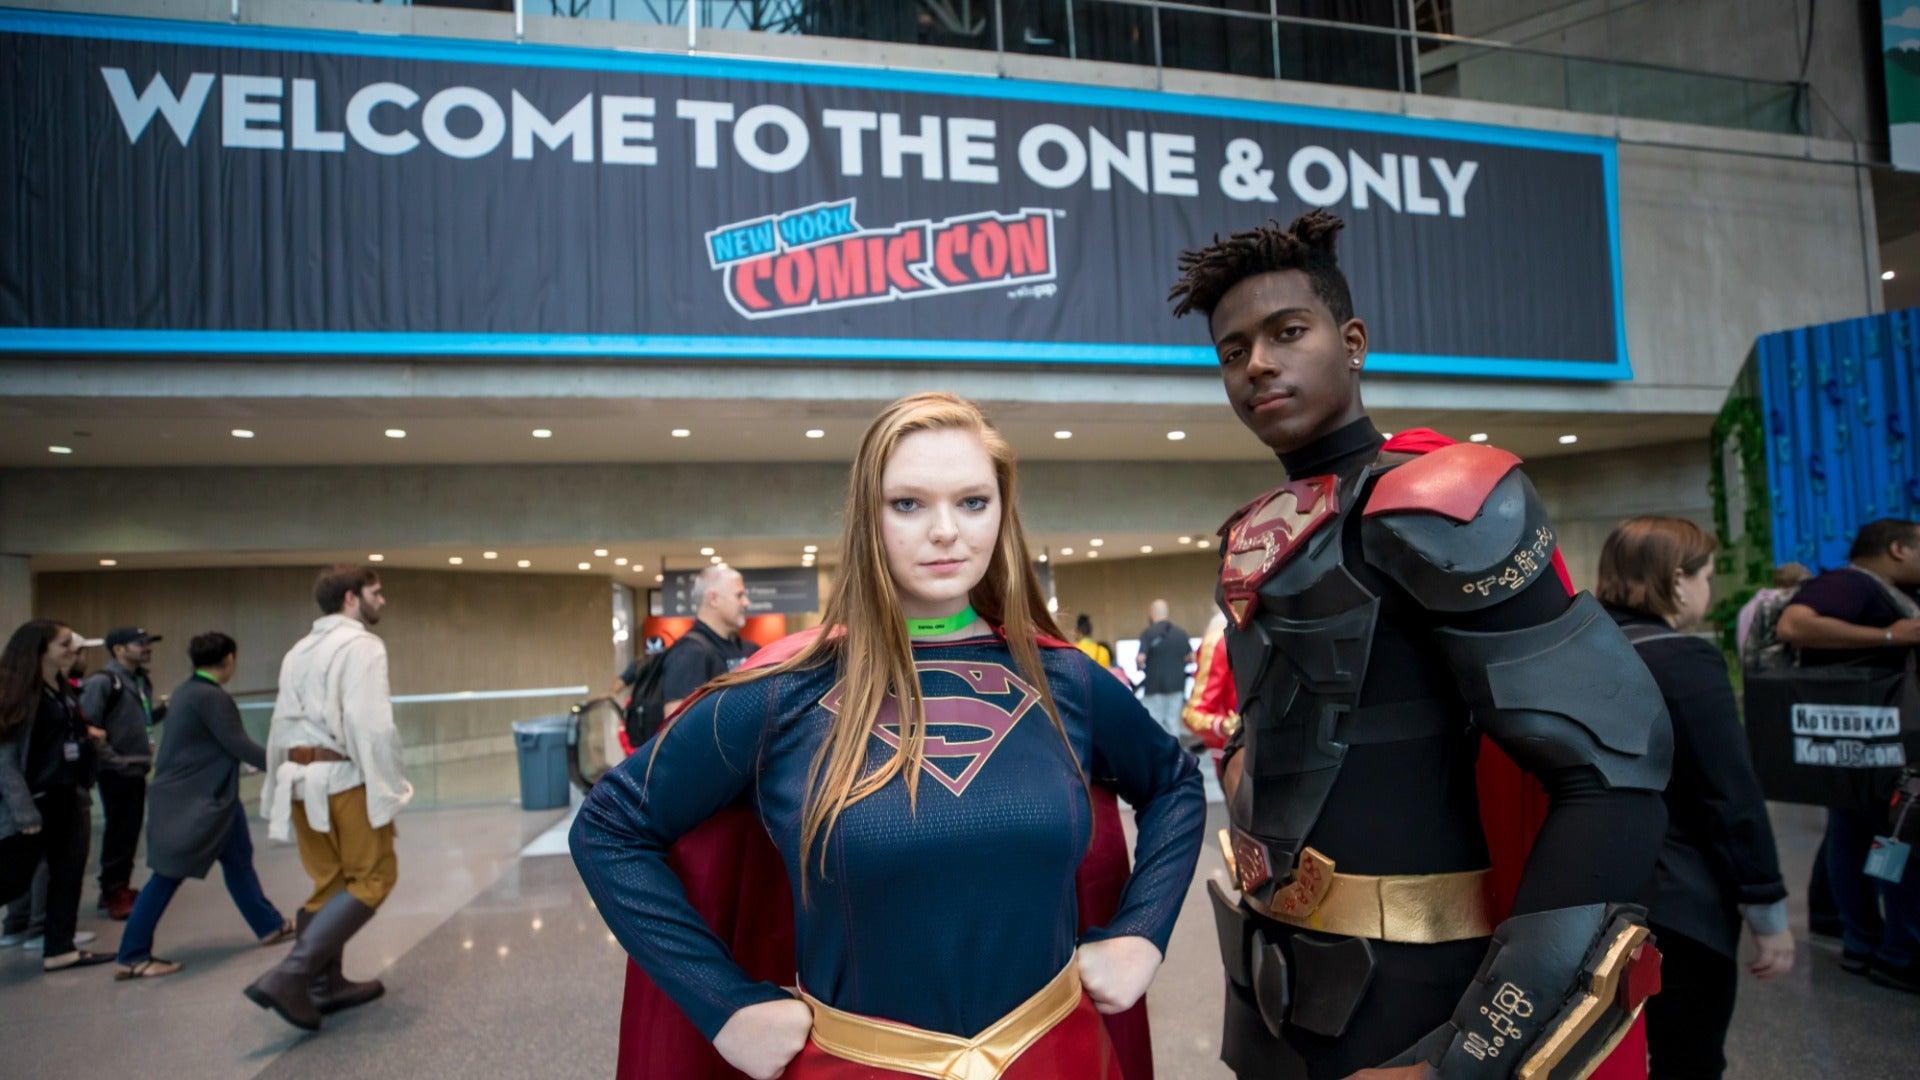 Courtesy New York Comic Con